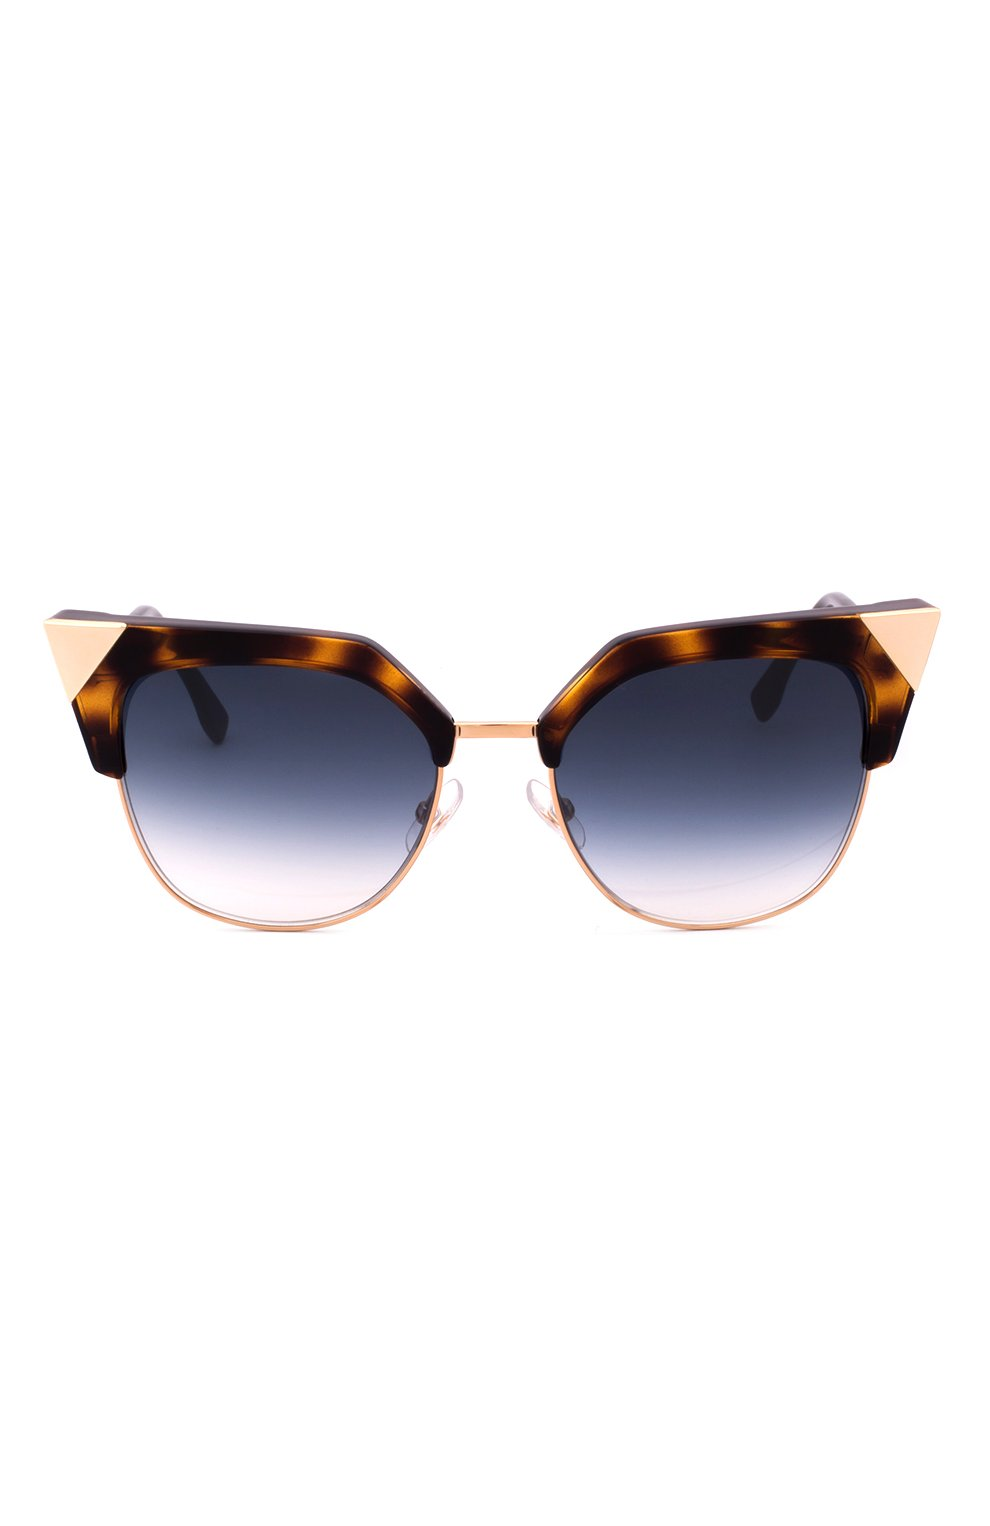 Женские солнцезащитные очки FENDI синего цвета, арт. 0149 TLW   Фото 1